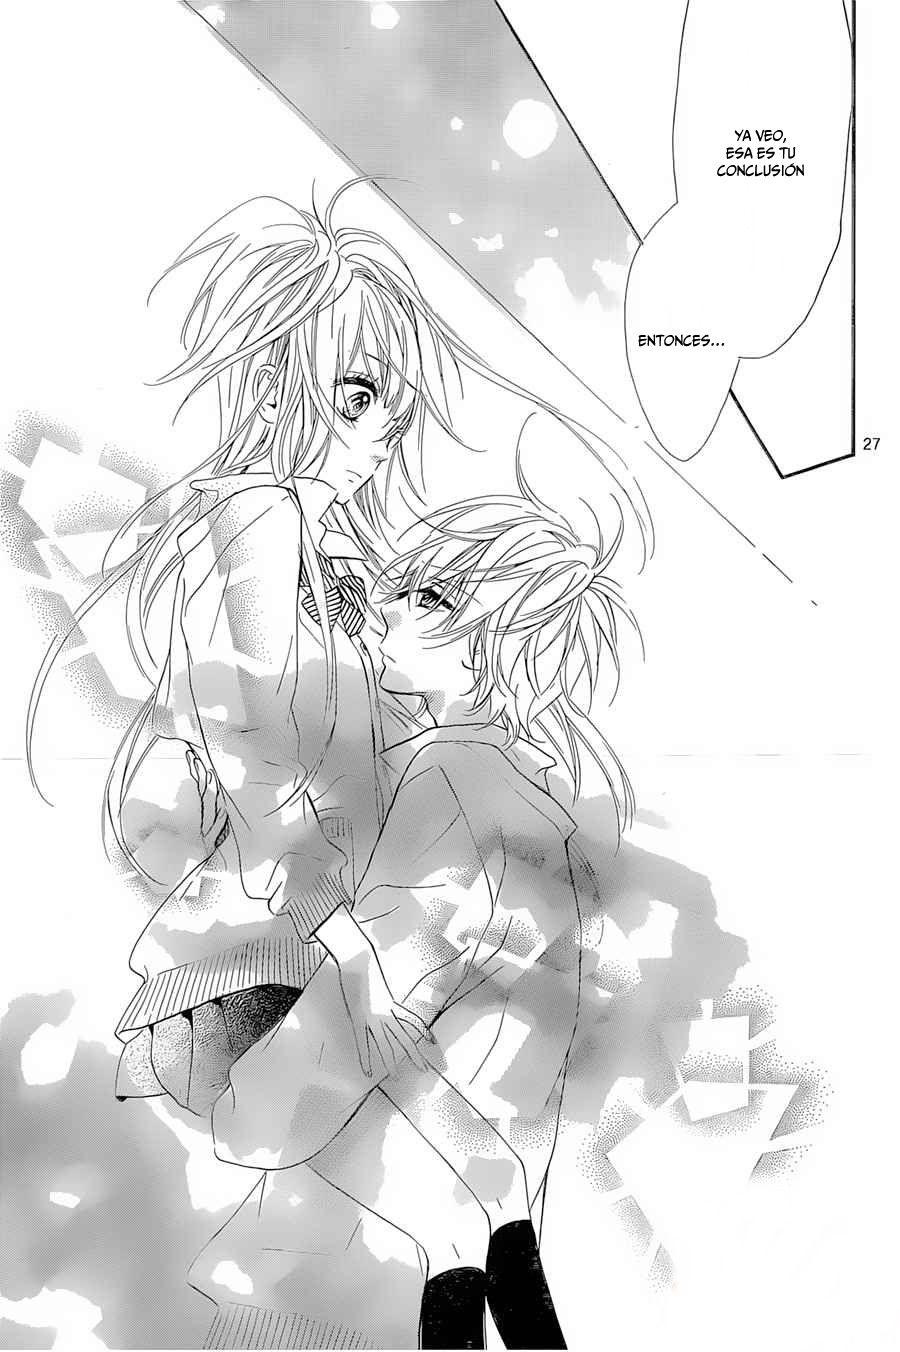 Batoto Read Your Favorite Comics Online Good Manga Manga Love Anime